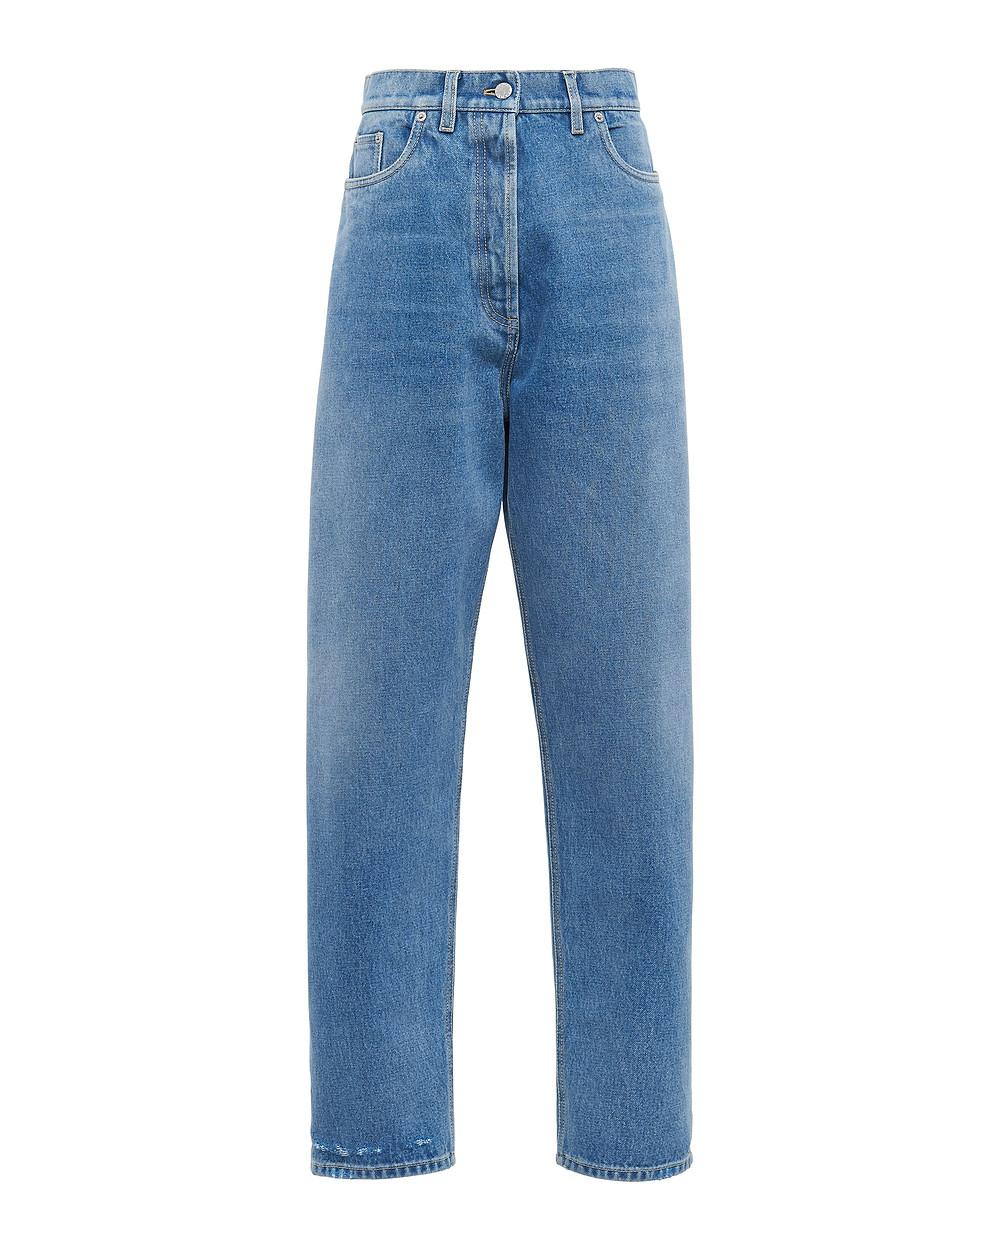 Prada organic denim five-pocket jeans